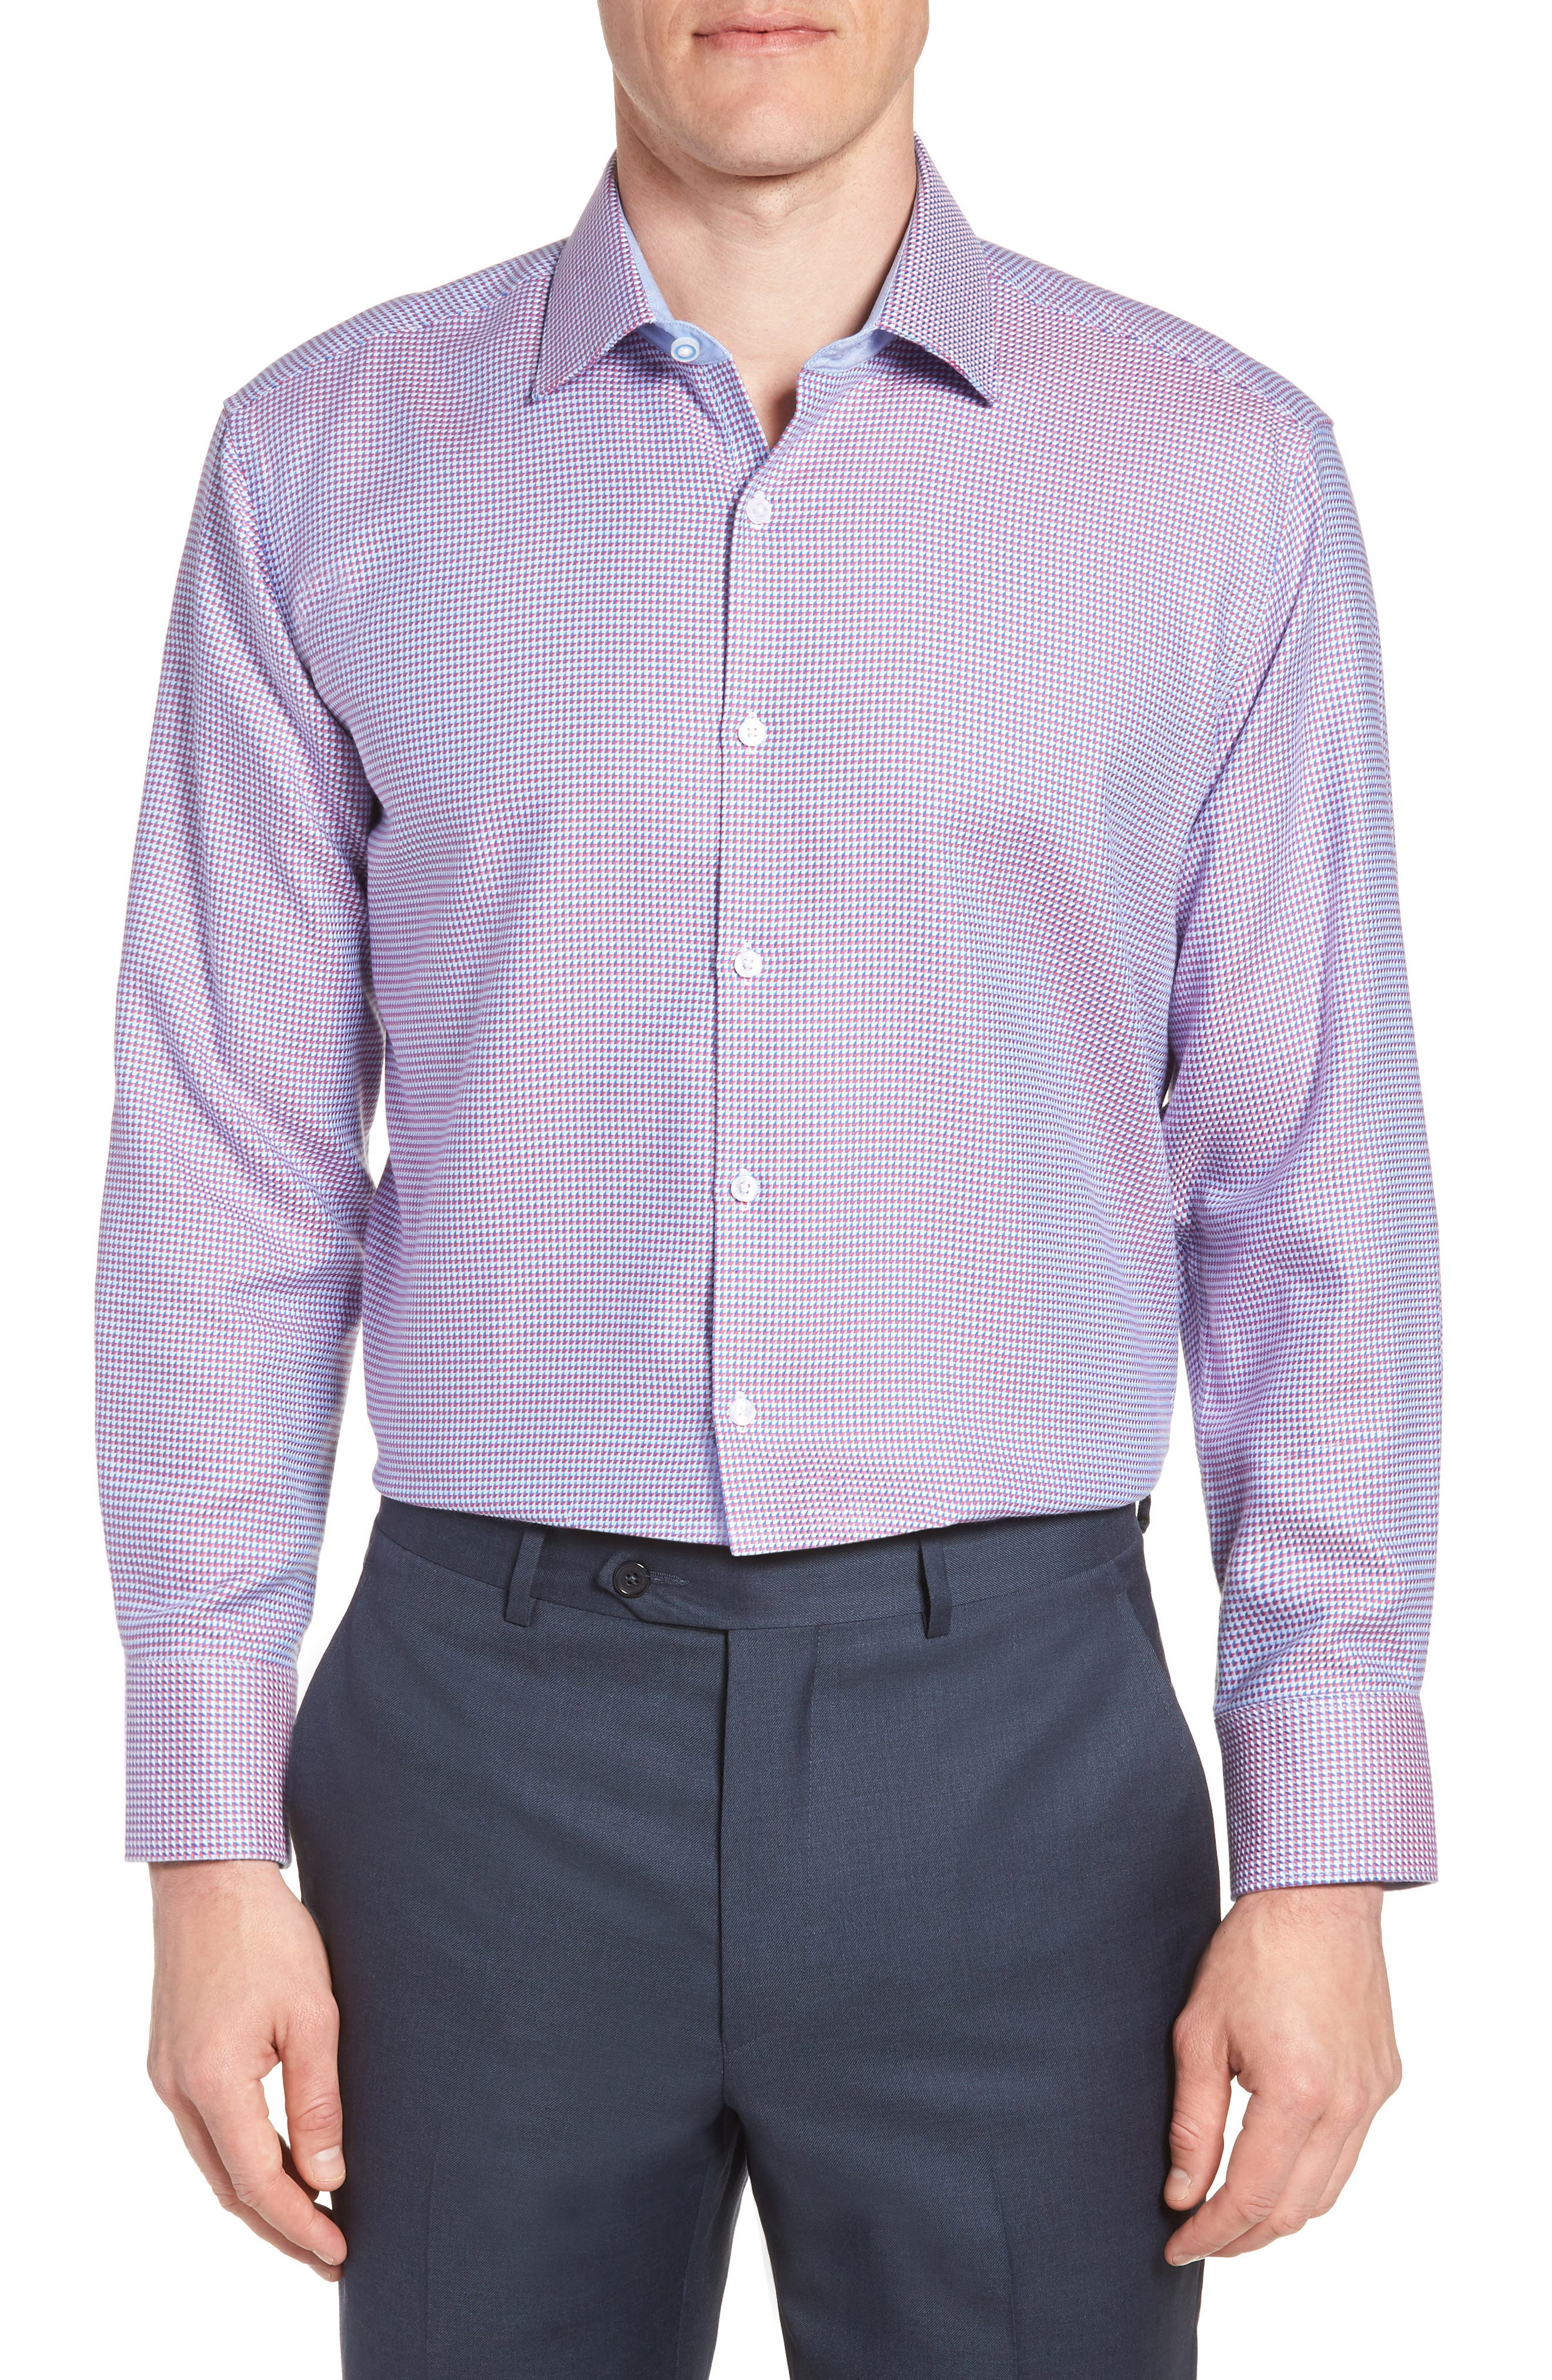 Axton Trim Fit Geometric Dress Shirt,                         Main,                         color, Red/ Blue